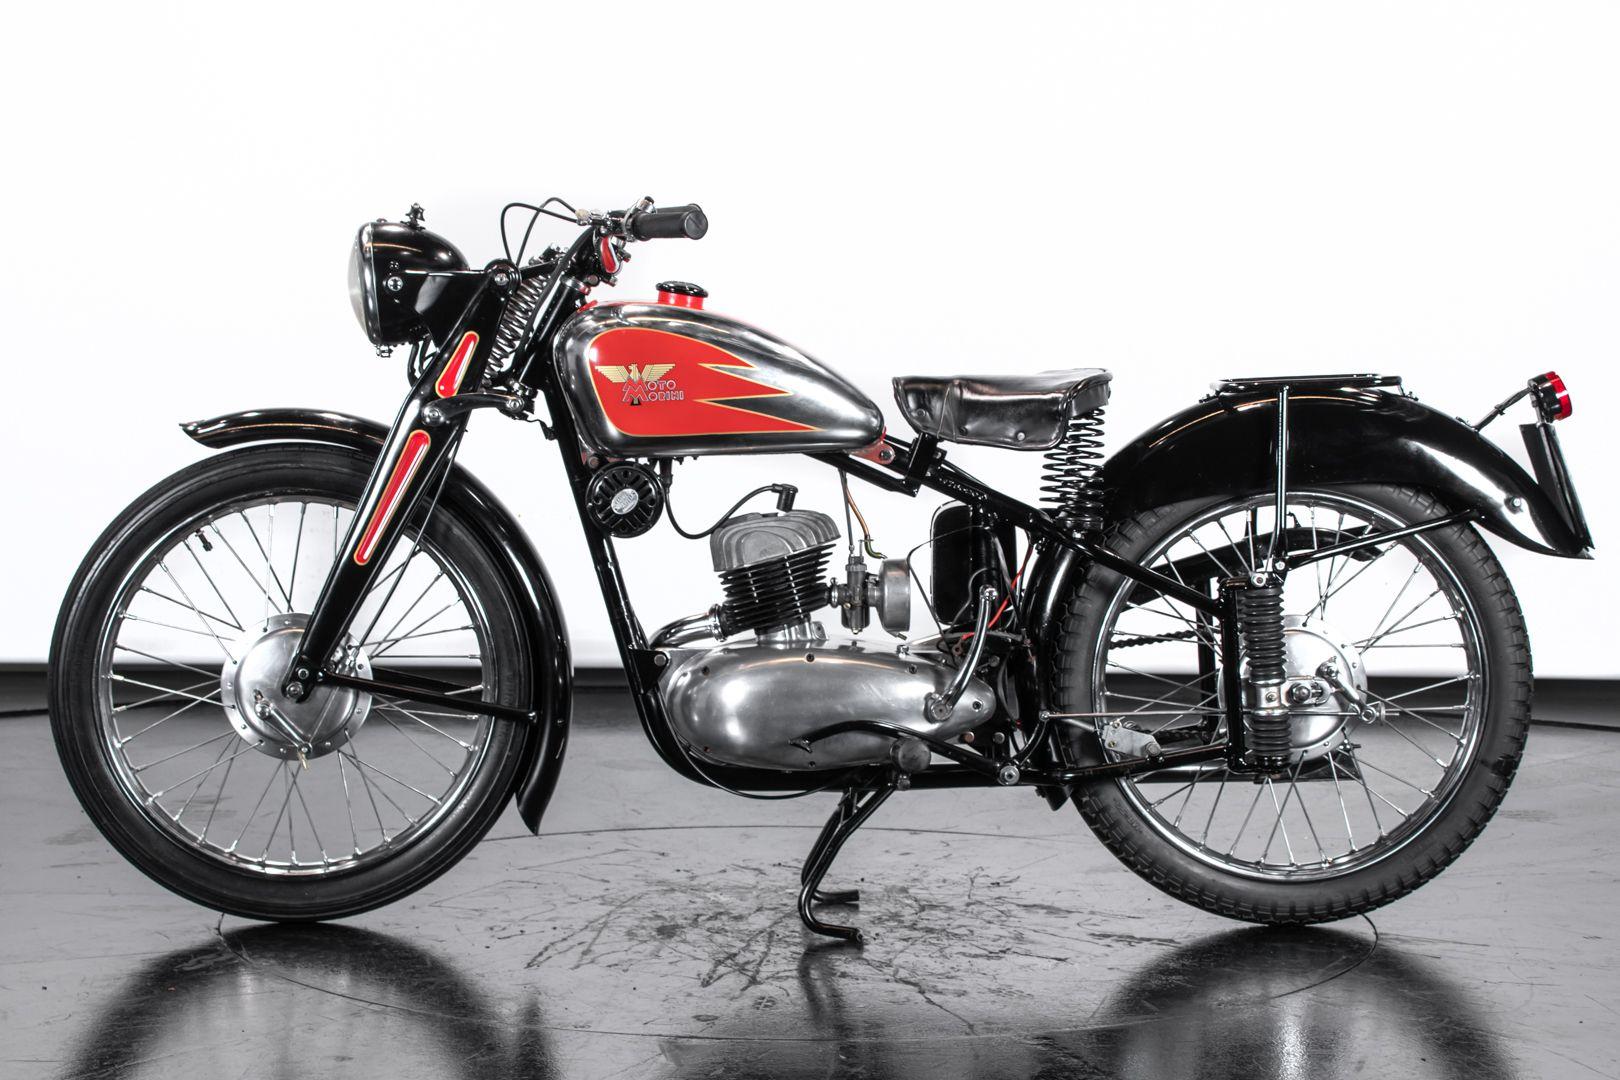 1952 Moto Morini Motore Lungo 2T 125 78767